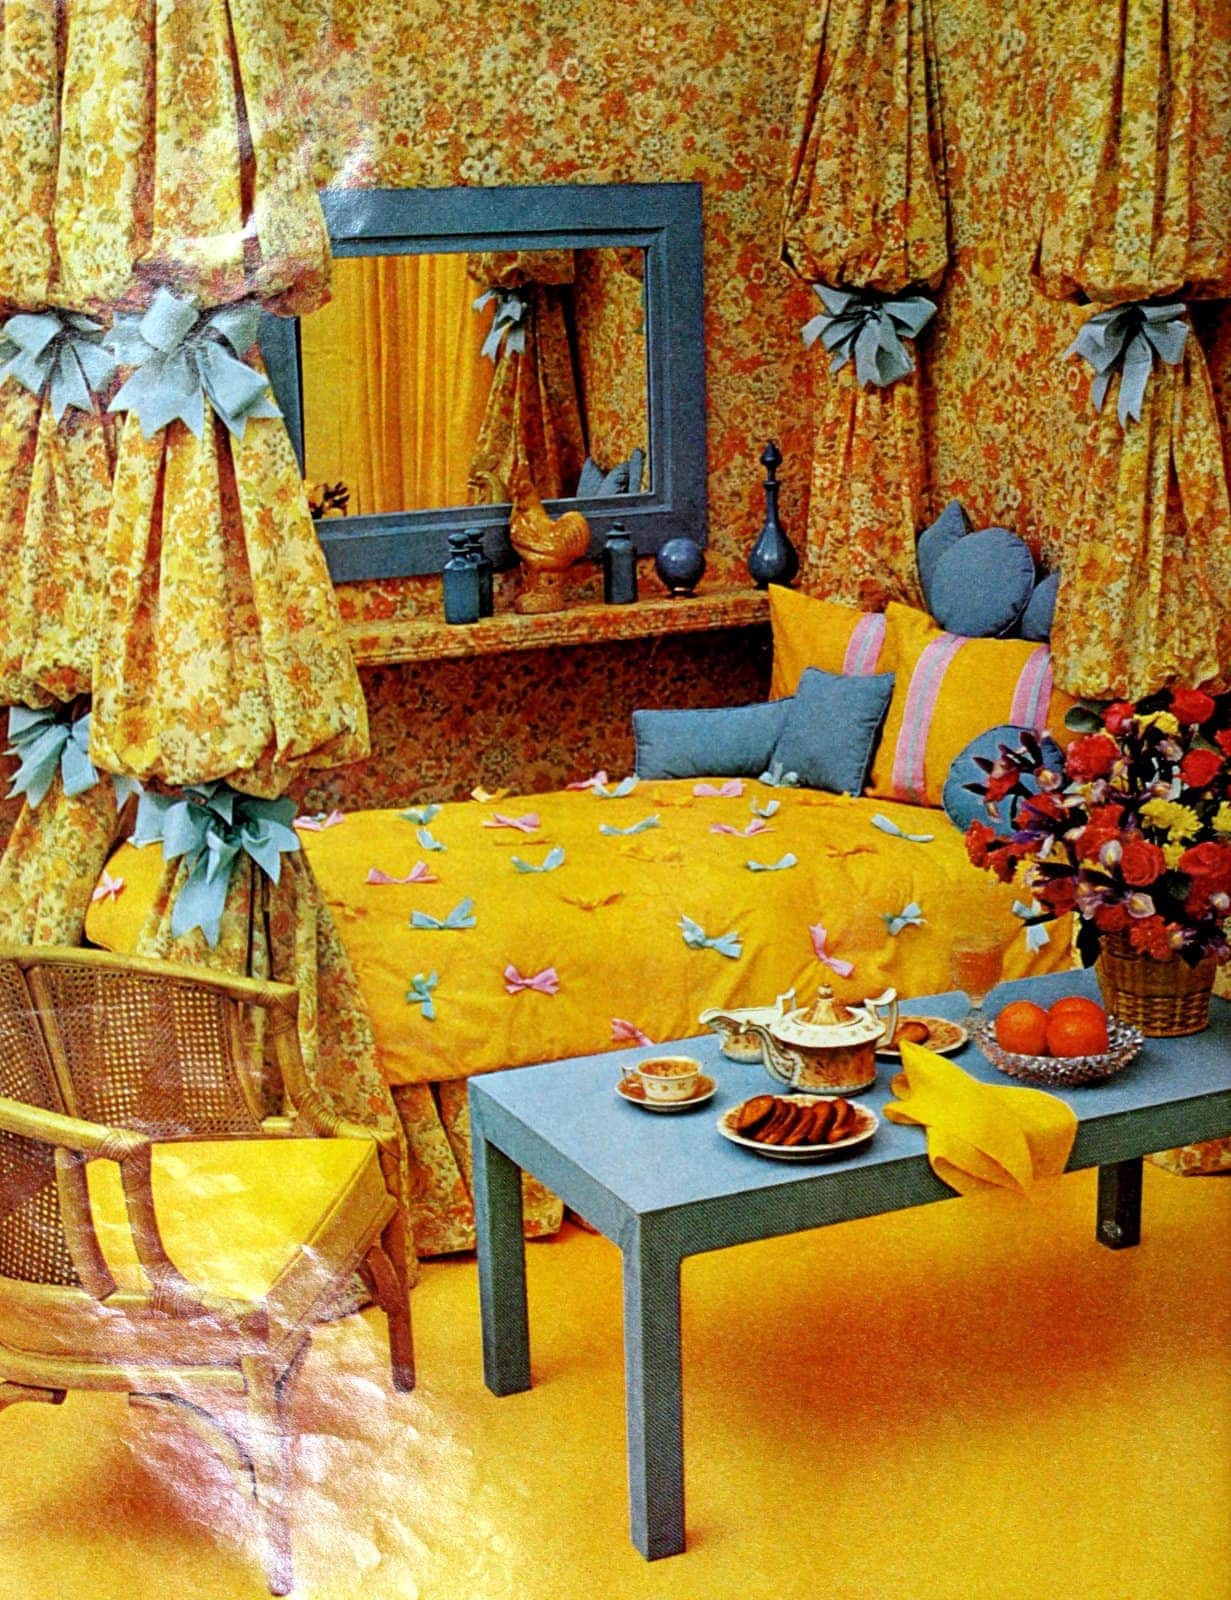 Ribbony retro kids' bedroom decor (1973)